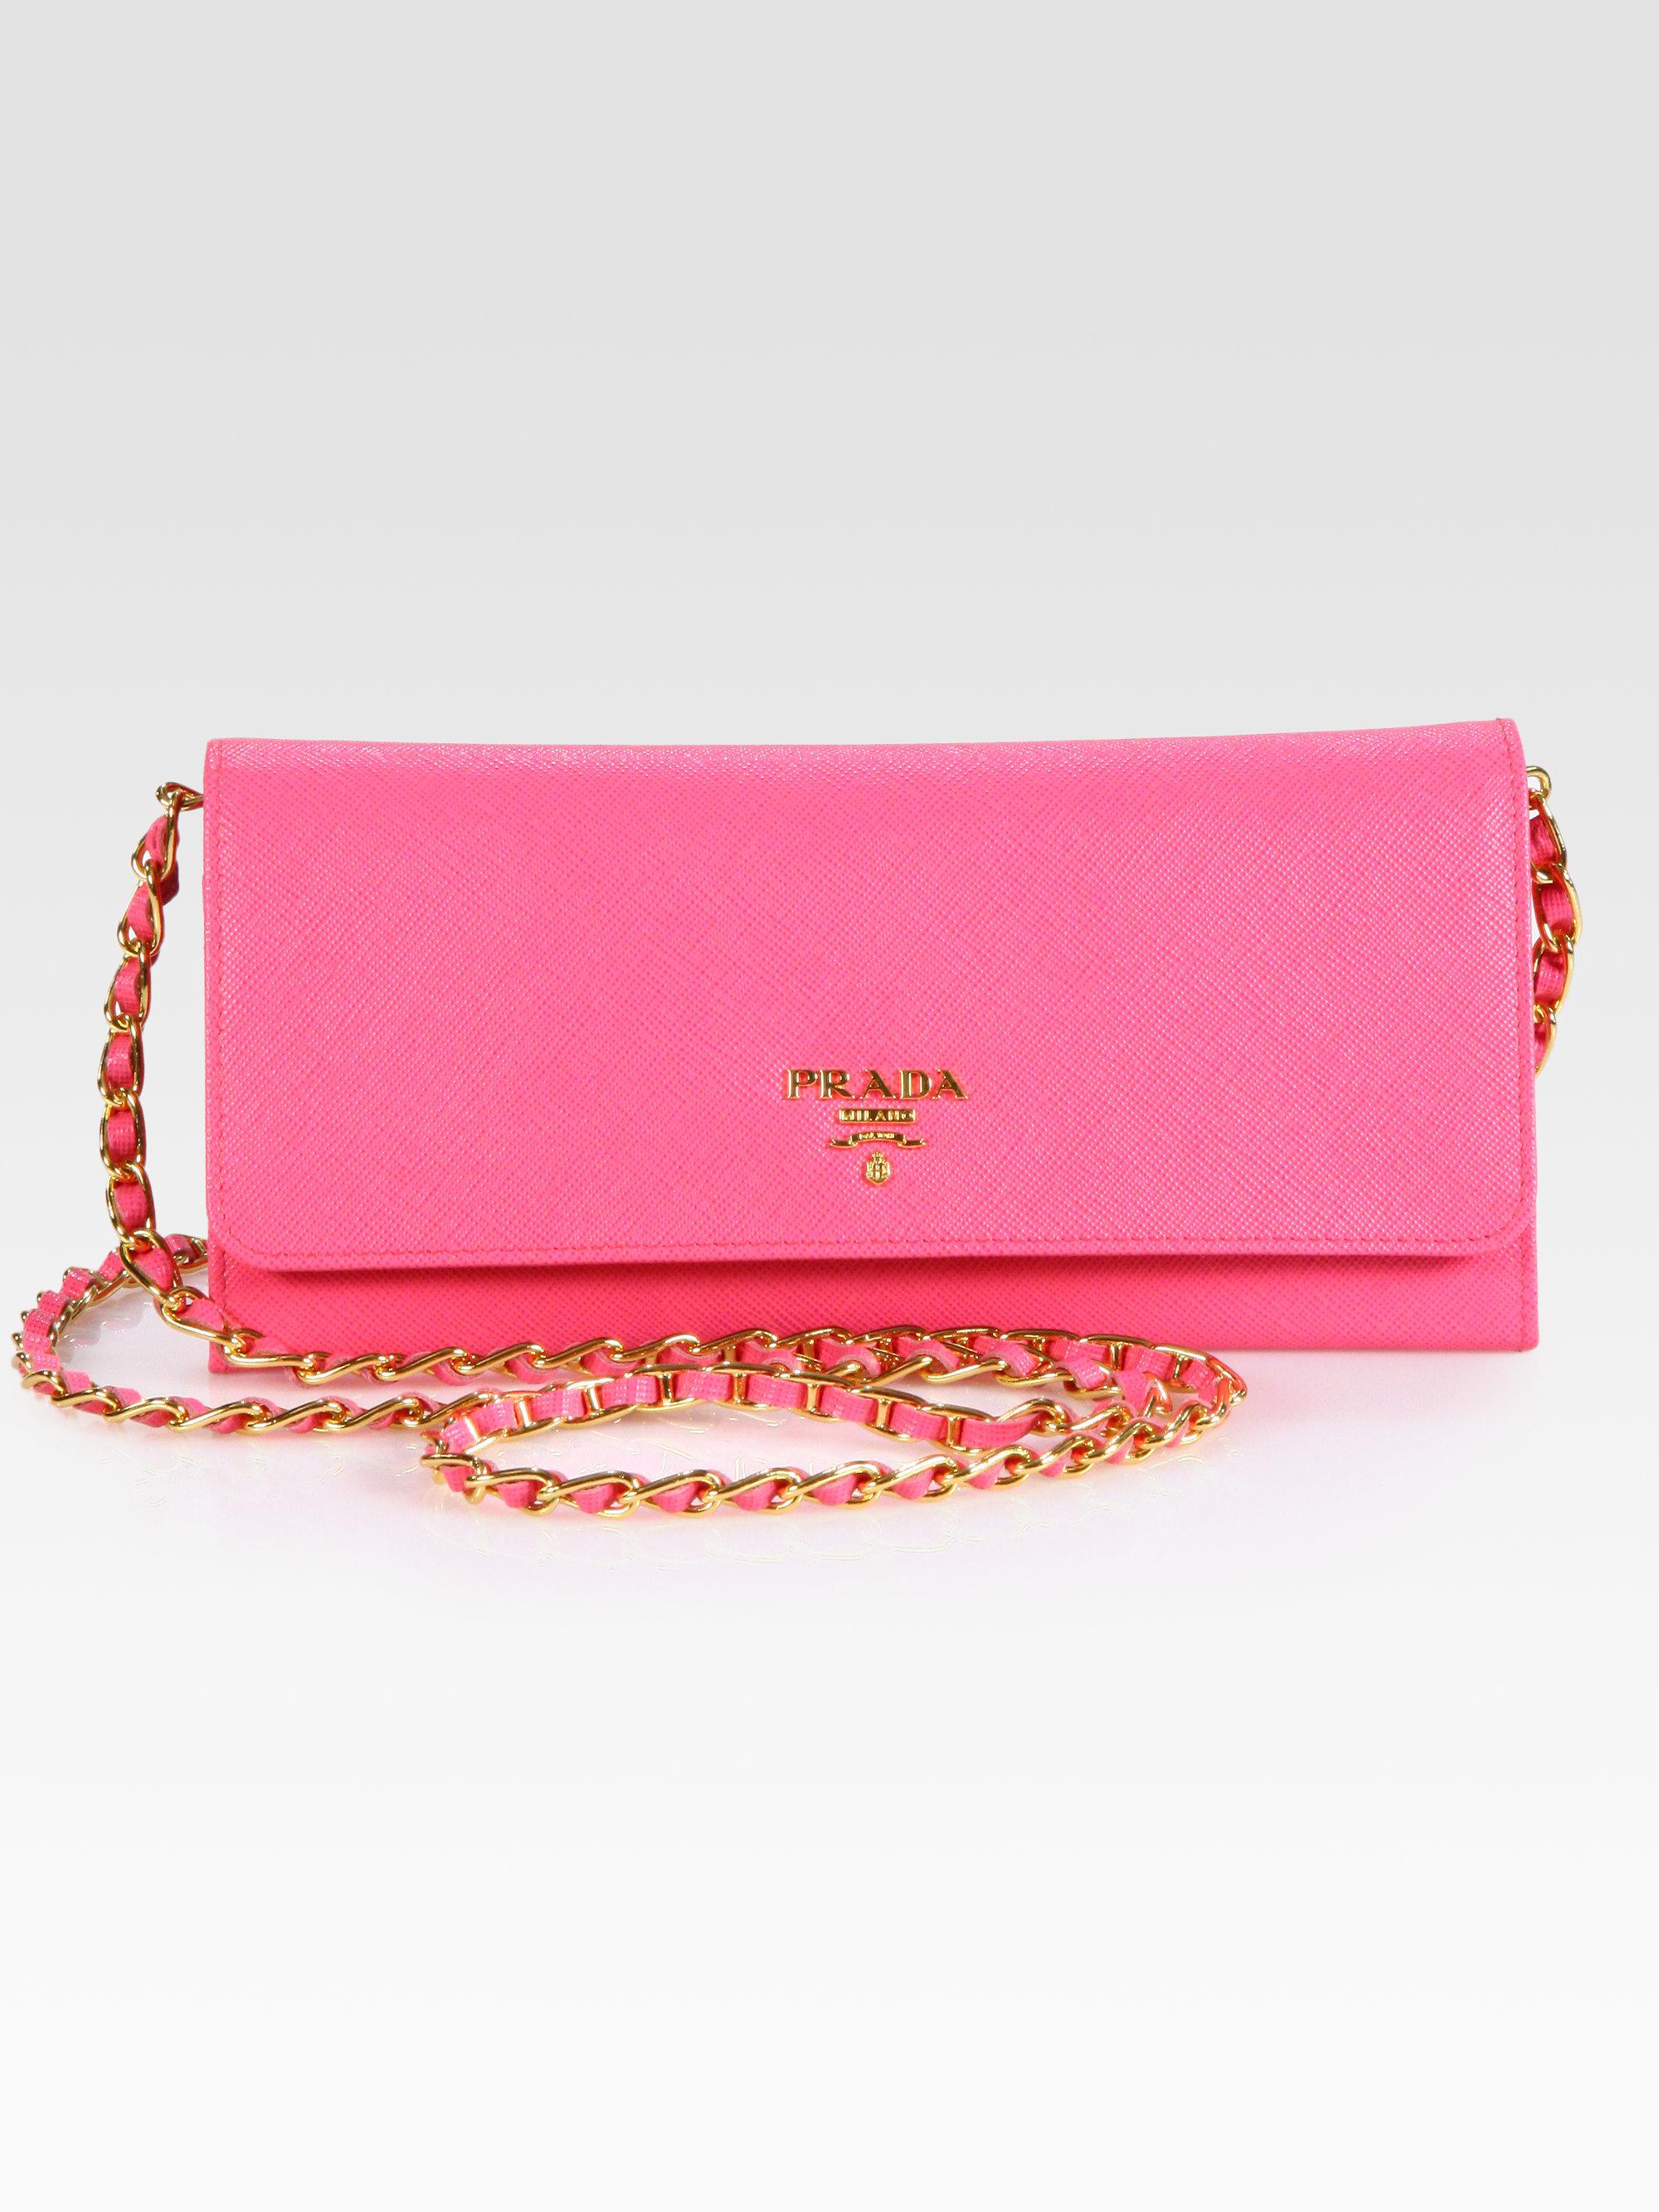 pink leather prada handbags - prada pink wallet